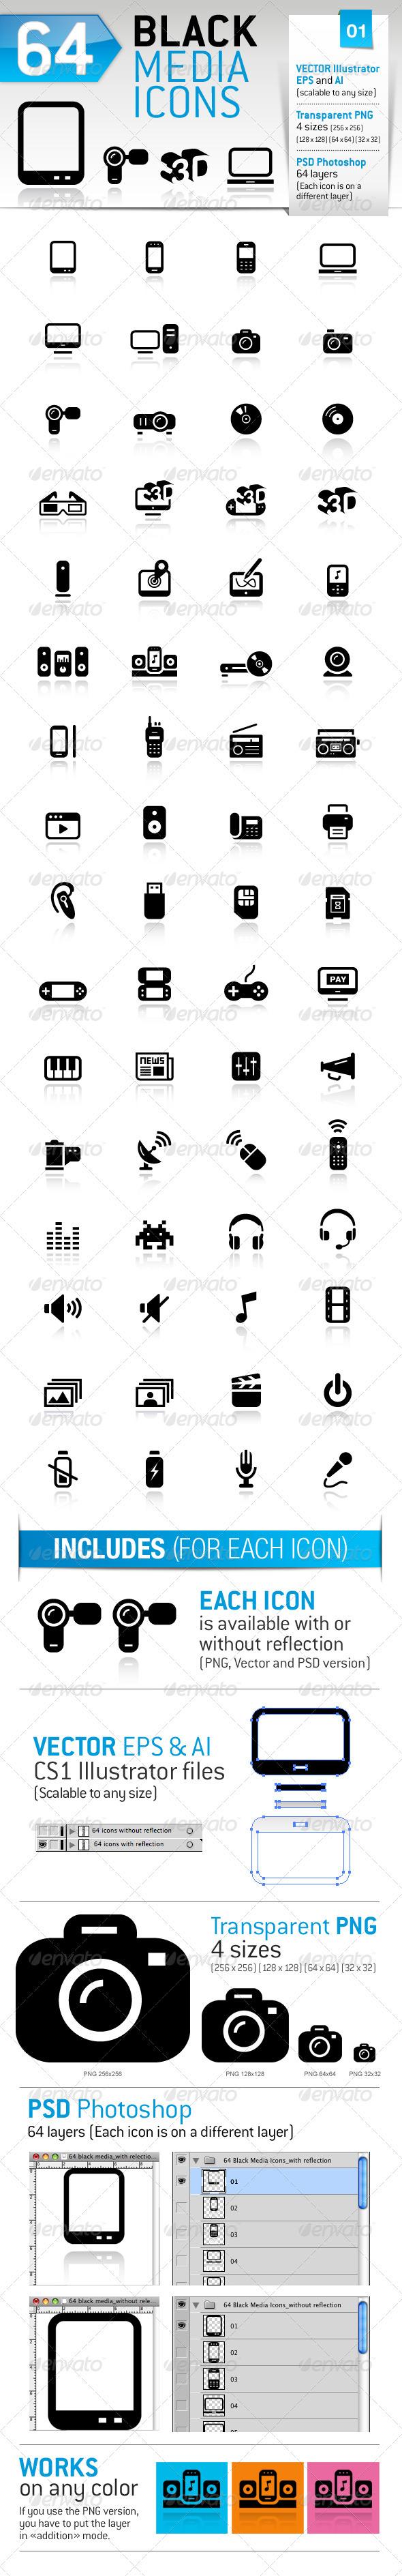 64 Black Media Icons - Media Icons